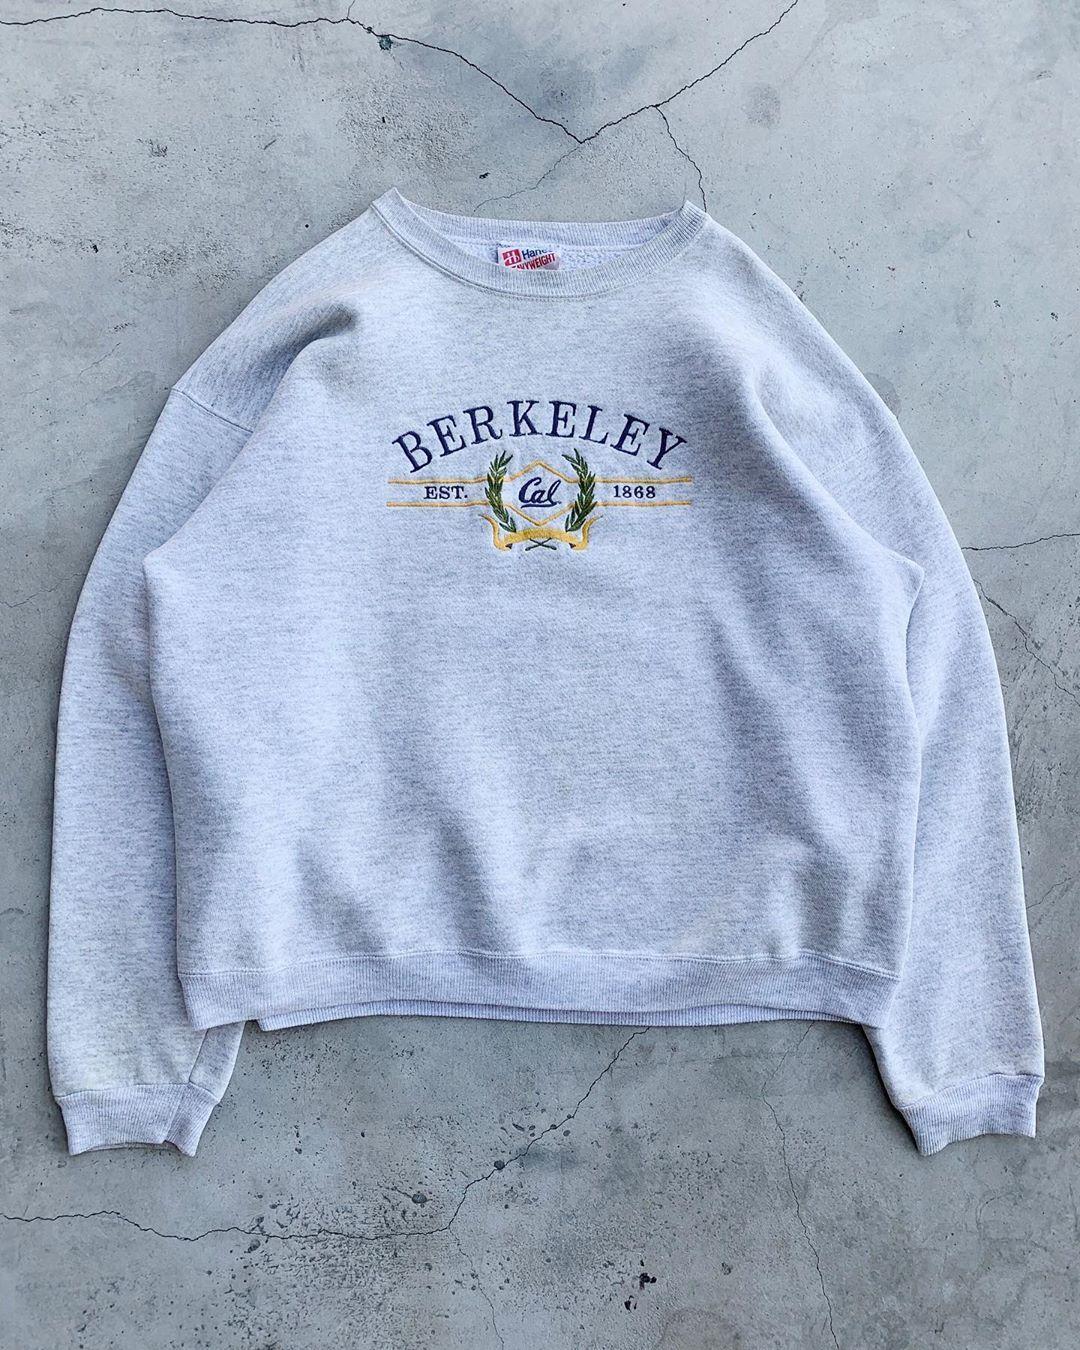 Unsound Rags On Instagram Vintage Cal Berkeley Crewneck Sweatshirt Crew Neck Sweatshirt Sweatshirts Graphic Sweatshirt [ 1350 x 1080 Pixel ]